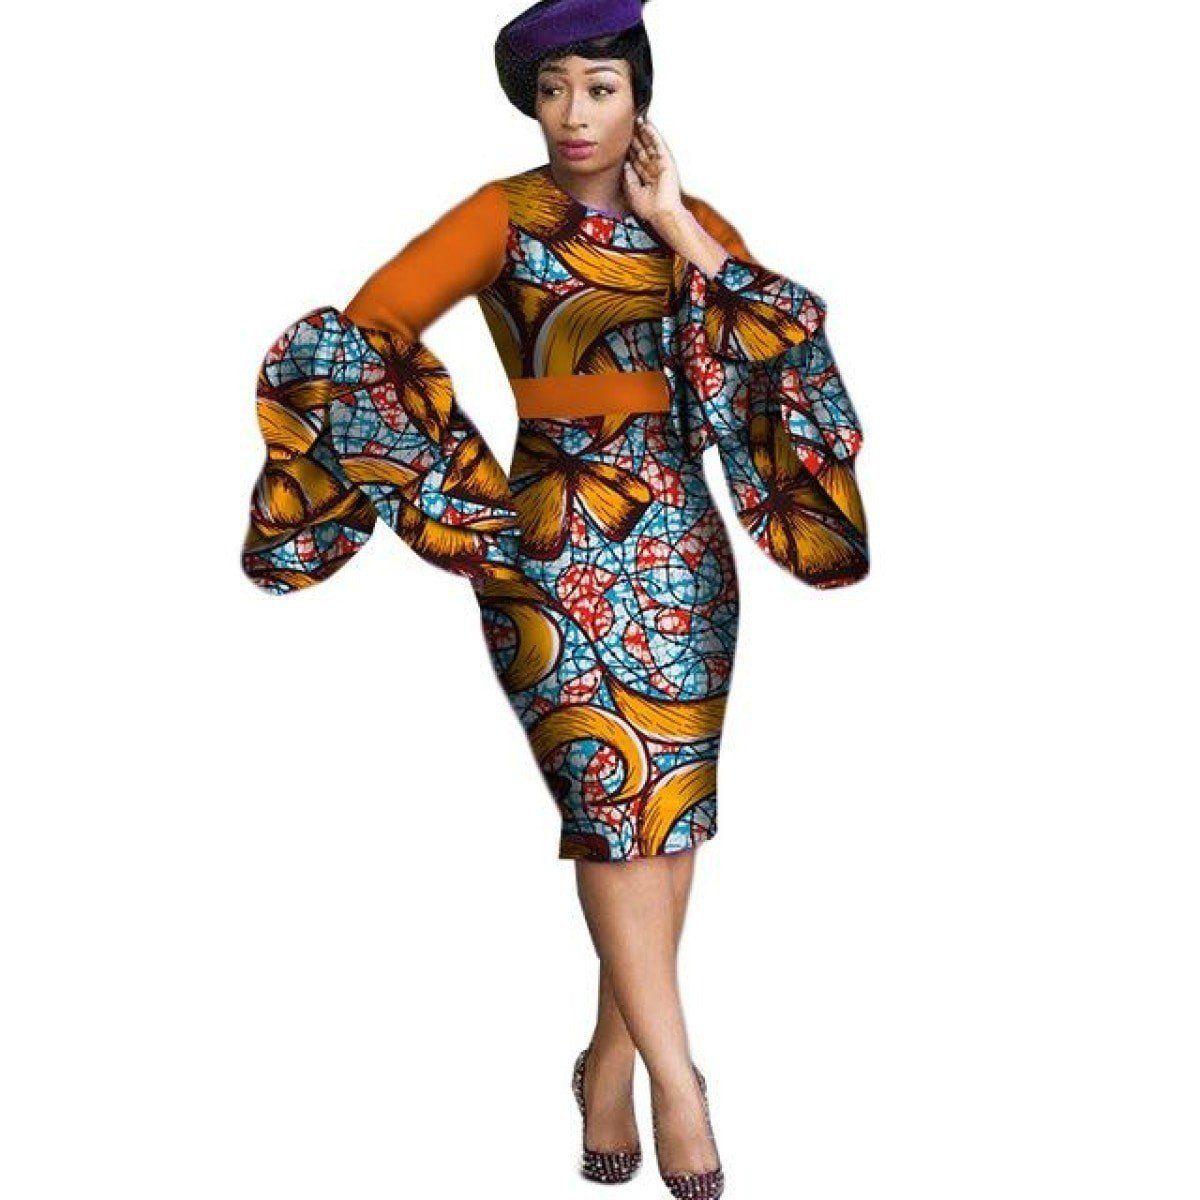 cd63965989200 African Cotton Dashiki Cotton Long Sleeve Vintage Dress For Women ...